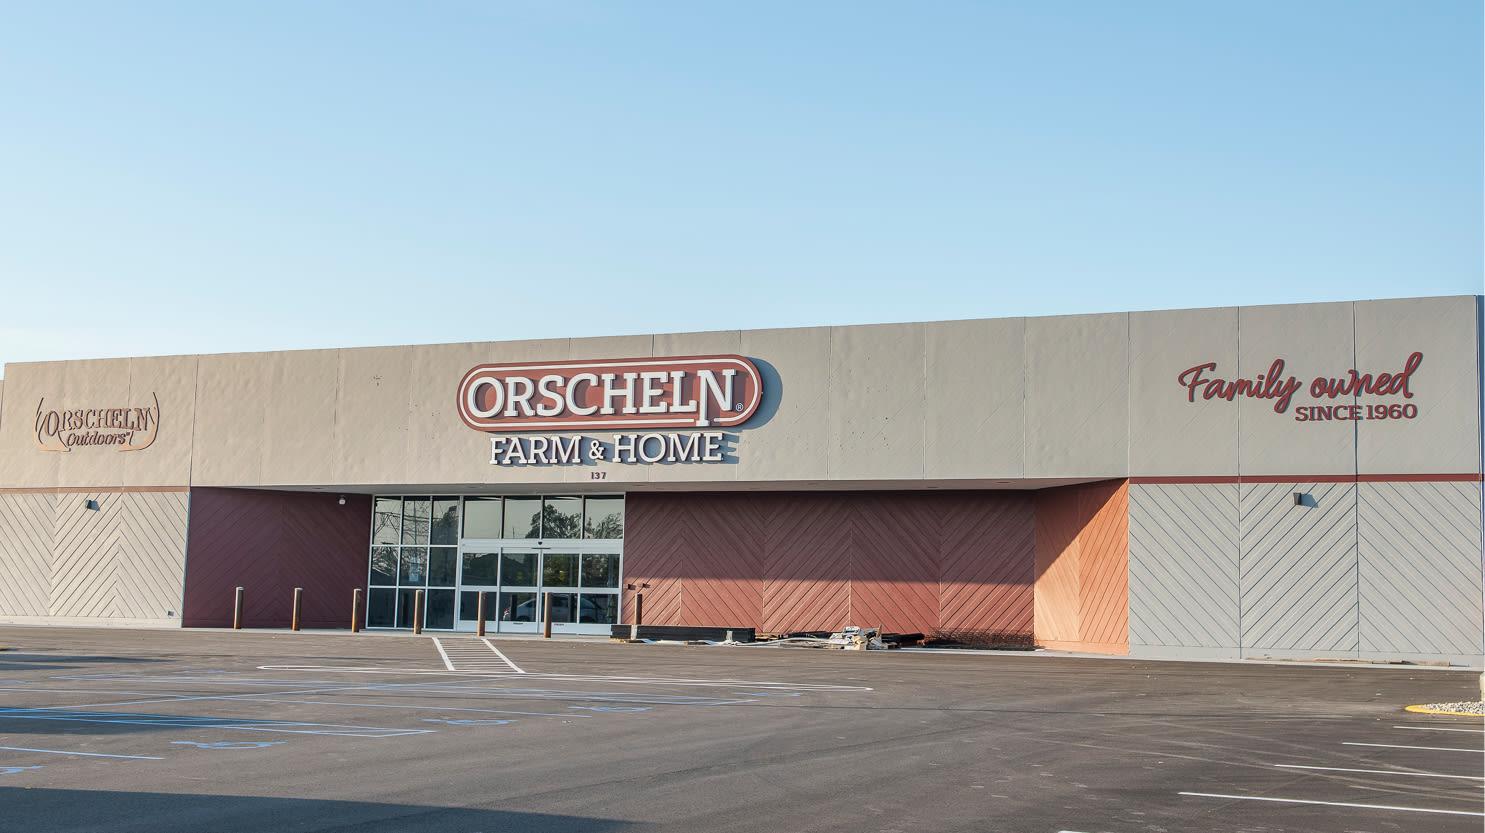 Front view of Orscheln Farm & Home Store in Saint Joseph, Missouri 64506